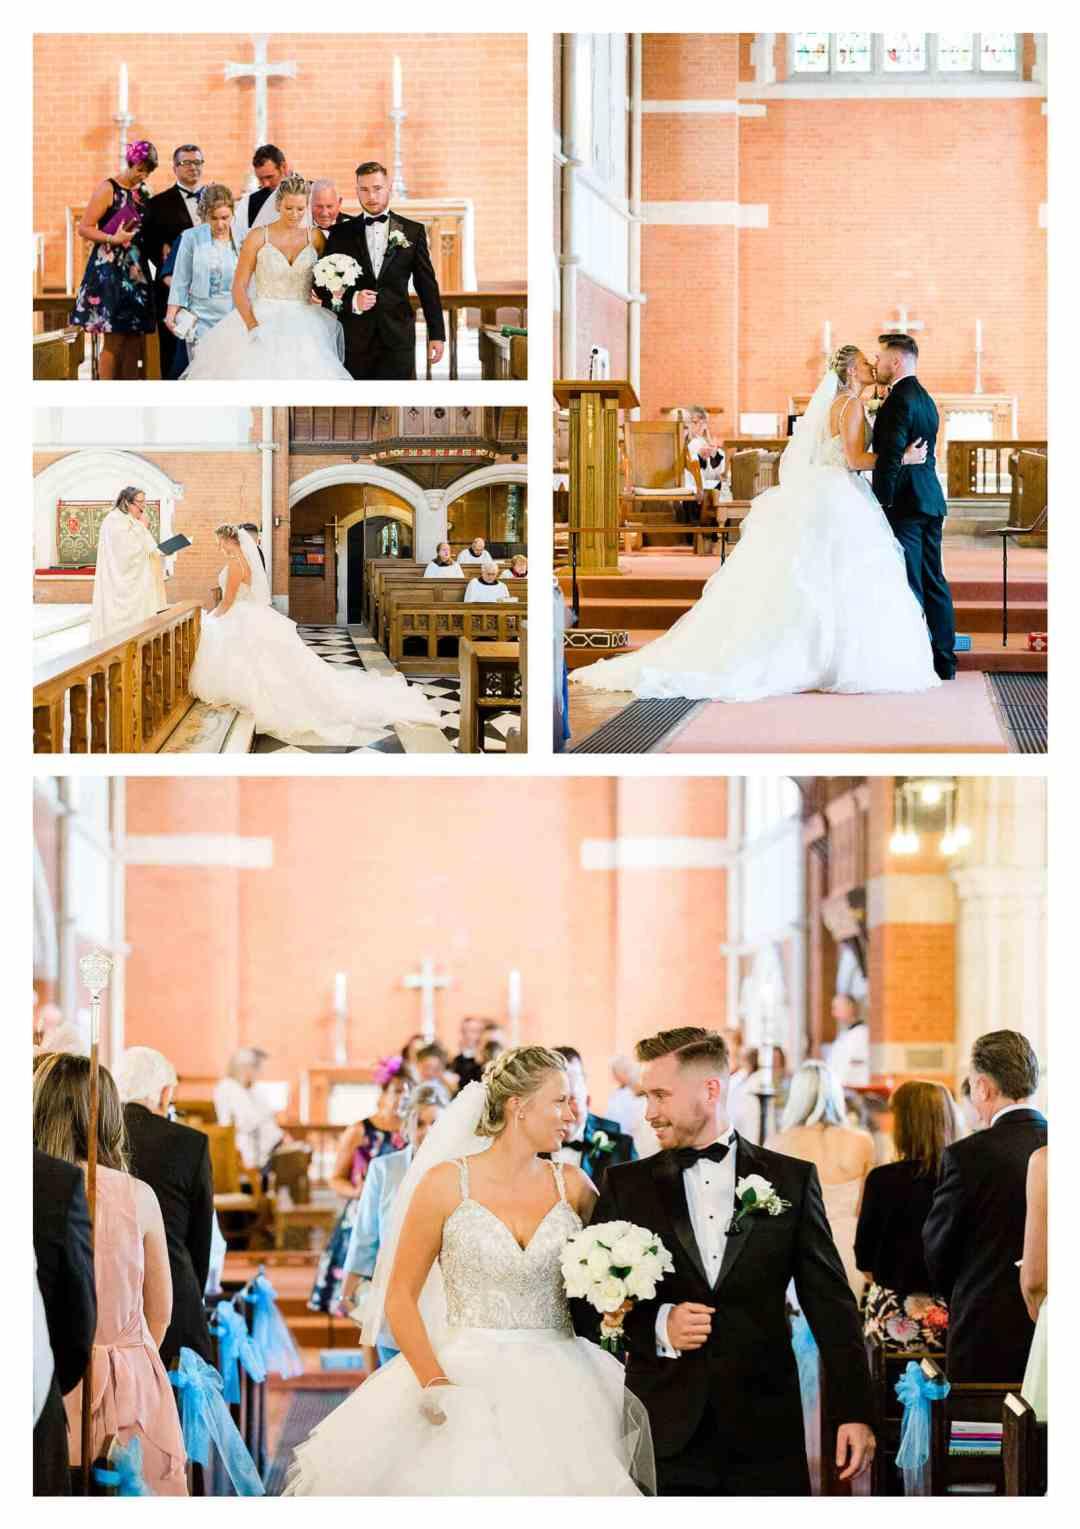 St Marks Church wedding ceremony in Purley | Croydon photographer